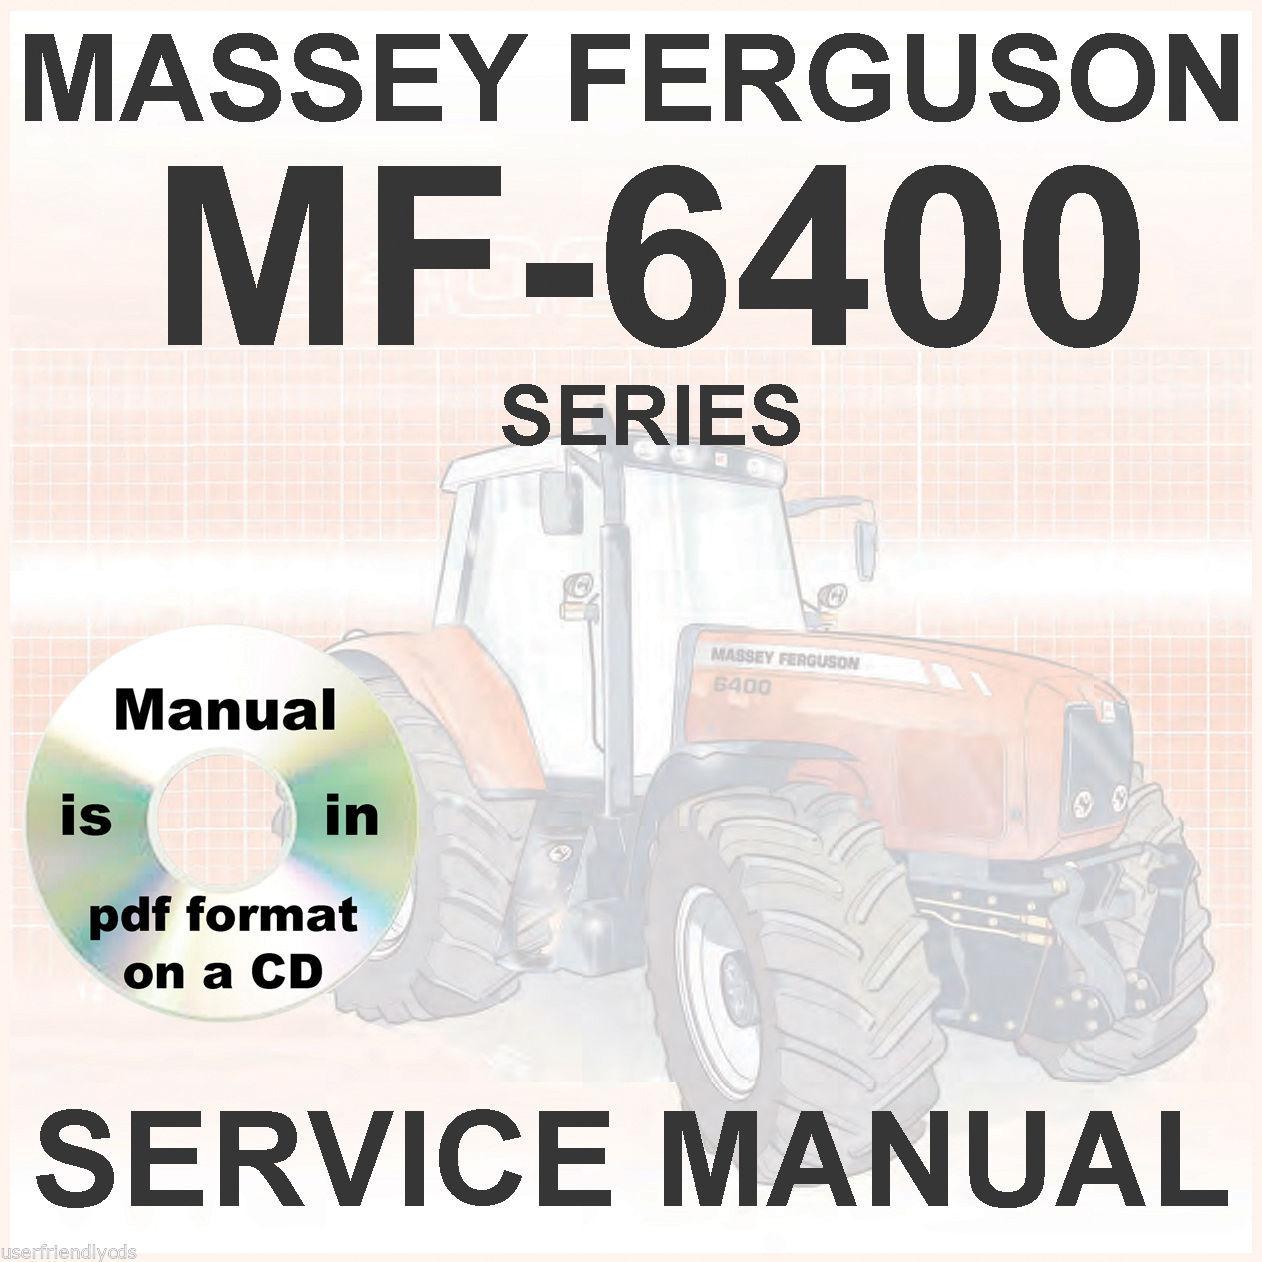 Massey Ferguson Tractors Shop Service Manual 6400 MF6445 MF6455 MF6460  MF6465 CD - $29.95